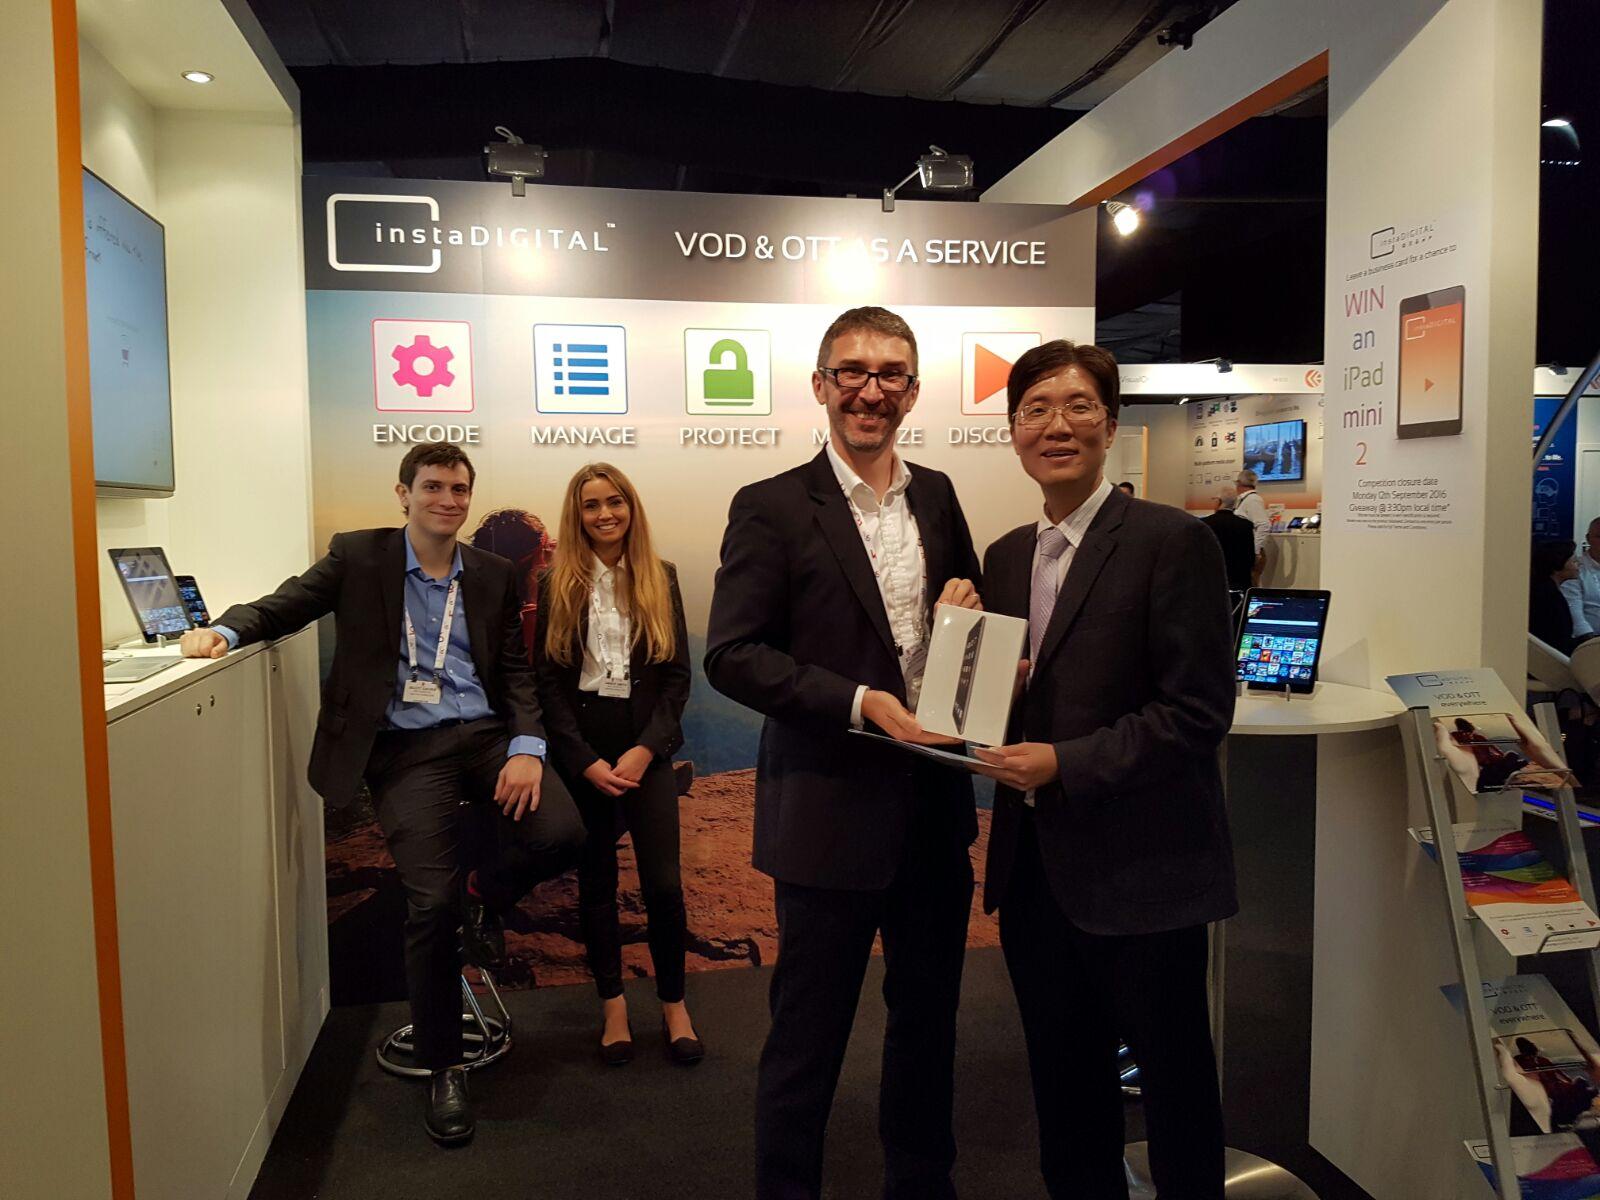 iPad give away winner at the instaDIGITAL® booth 2016